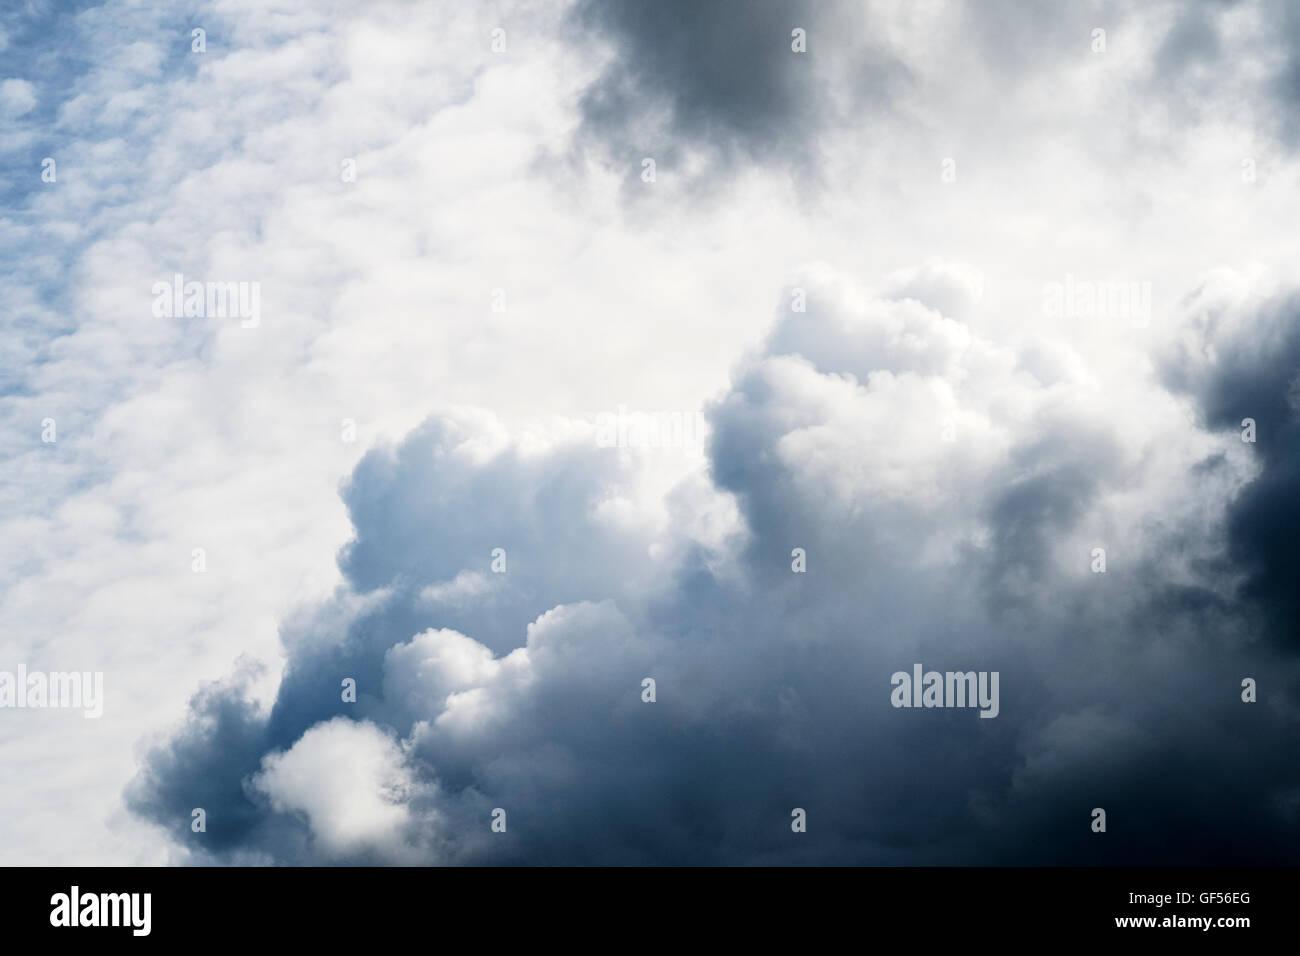 Cumulonimbus cloud formations in the sky. UK. - Stock Image